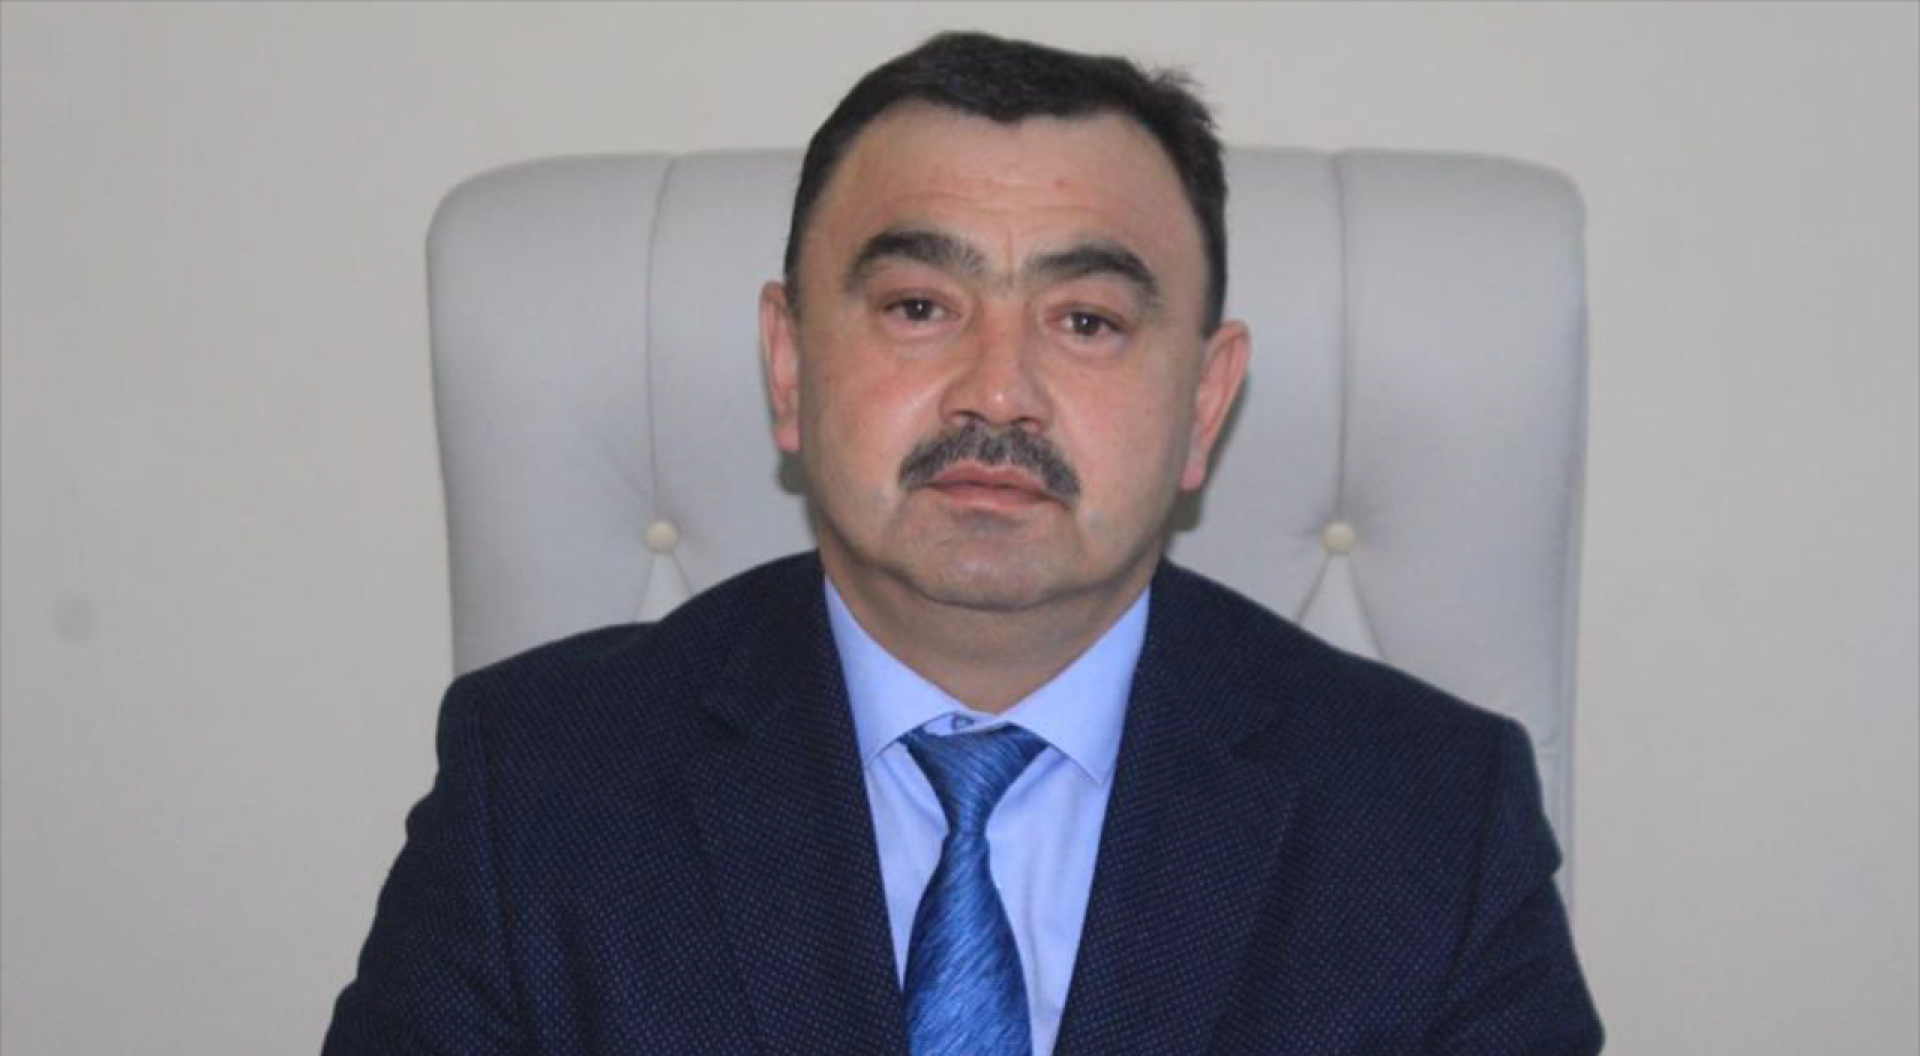 Досье: Байахметов Бакытжан Какенкаджиевич, Бакытжан Байахметов, акимат Восточно-Казахстанской области